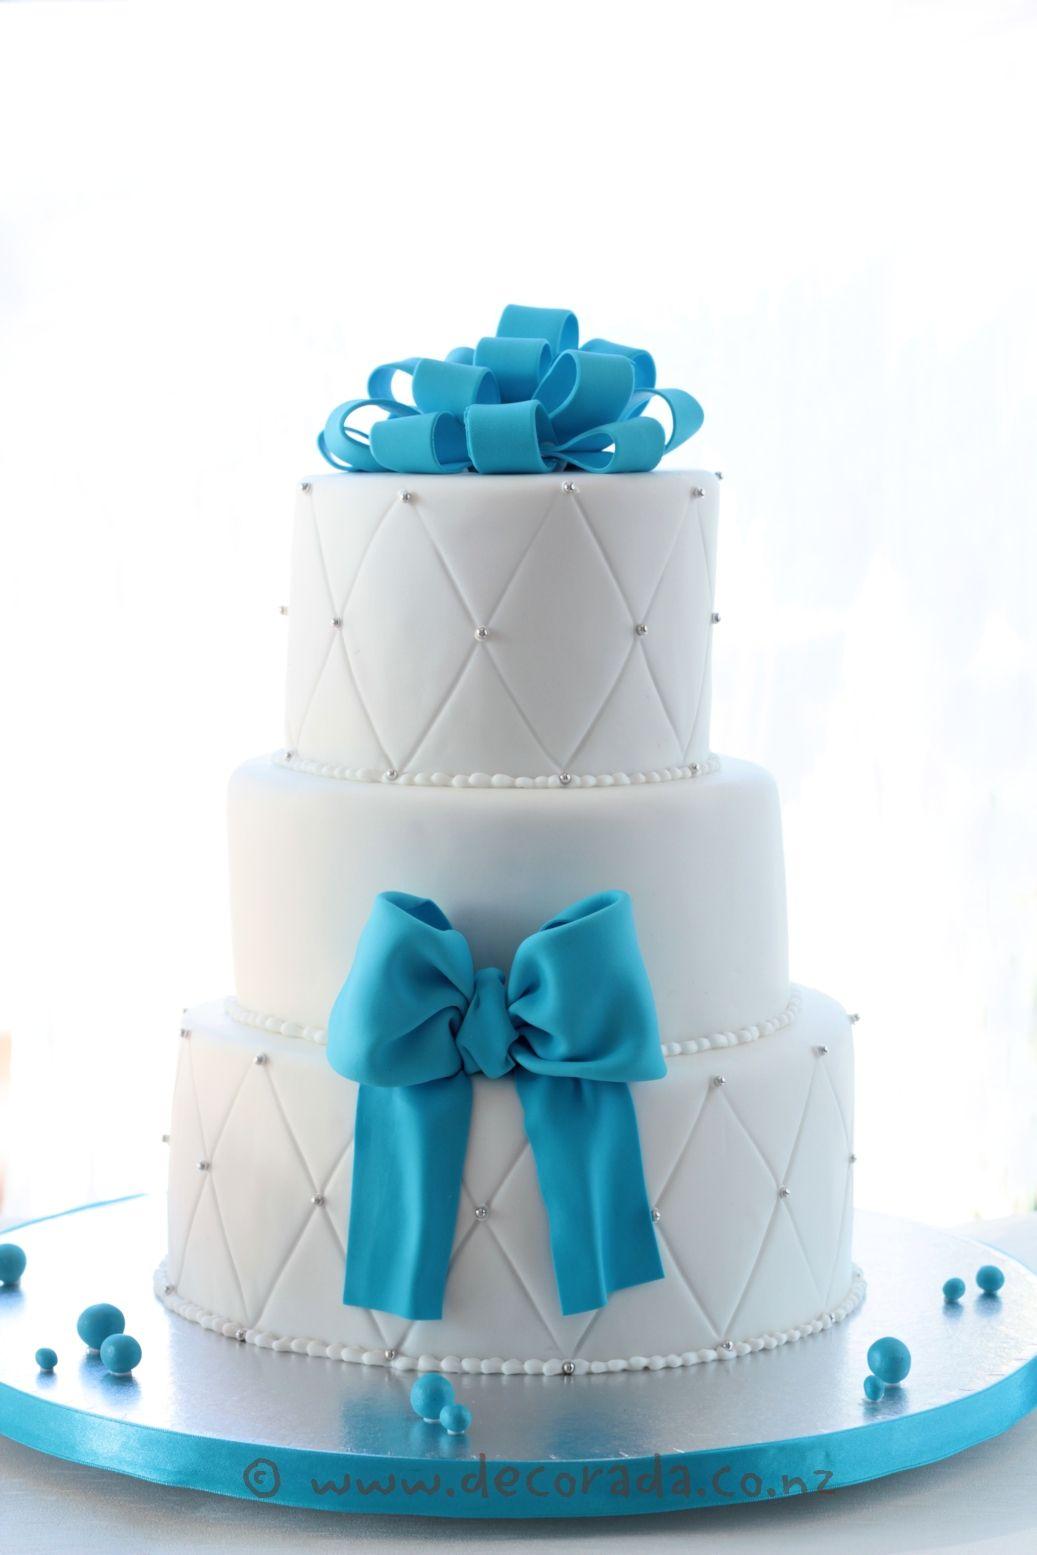 Silver Diamonds wedding cake. | Cakes | Pinterest | Silver diamond ...